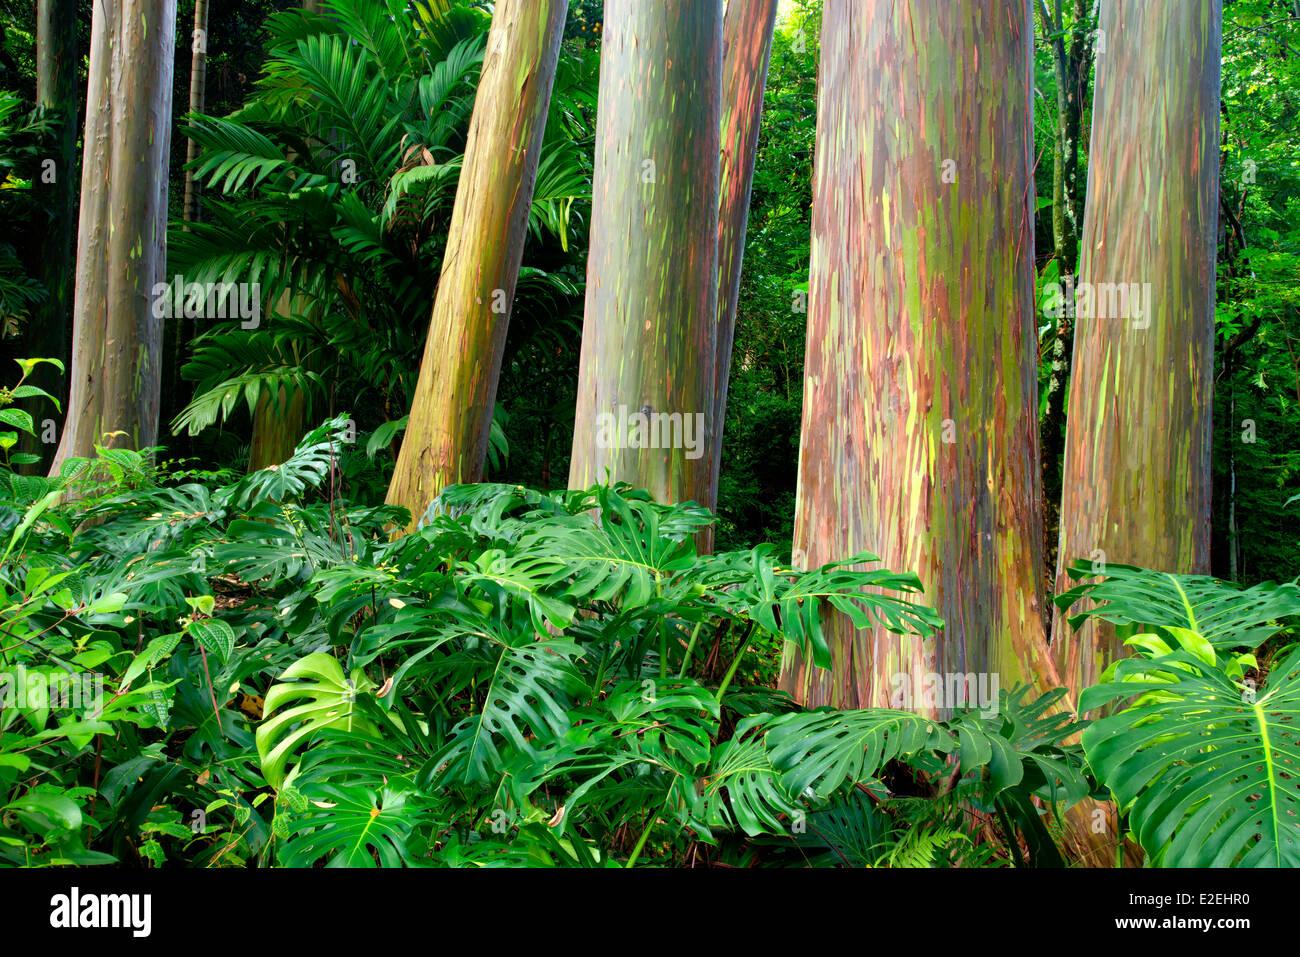 Regenbogen Eukalyptus (Eucalyptus Deglupta) ...und teilen Blatt Philodendron. Keanae Arboretum. Maui, Hawaii Stockbild